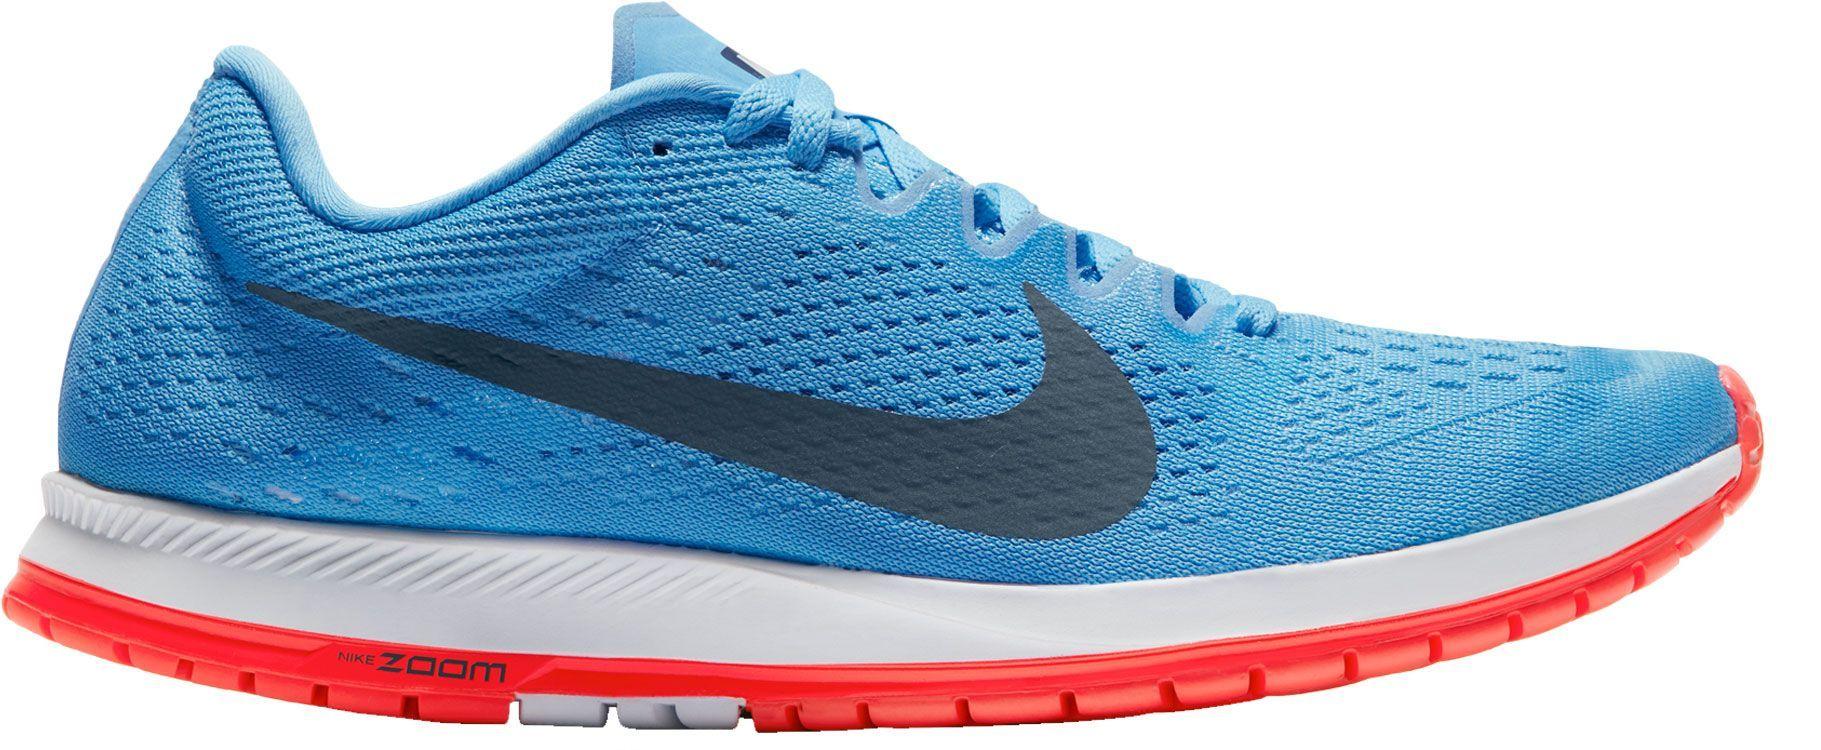 e185384450cc3 Nike Men s Zoom Streak 6 Track and Field Shoes